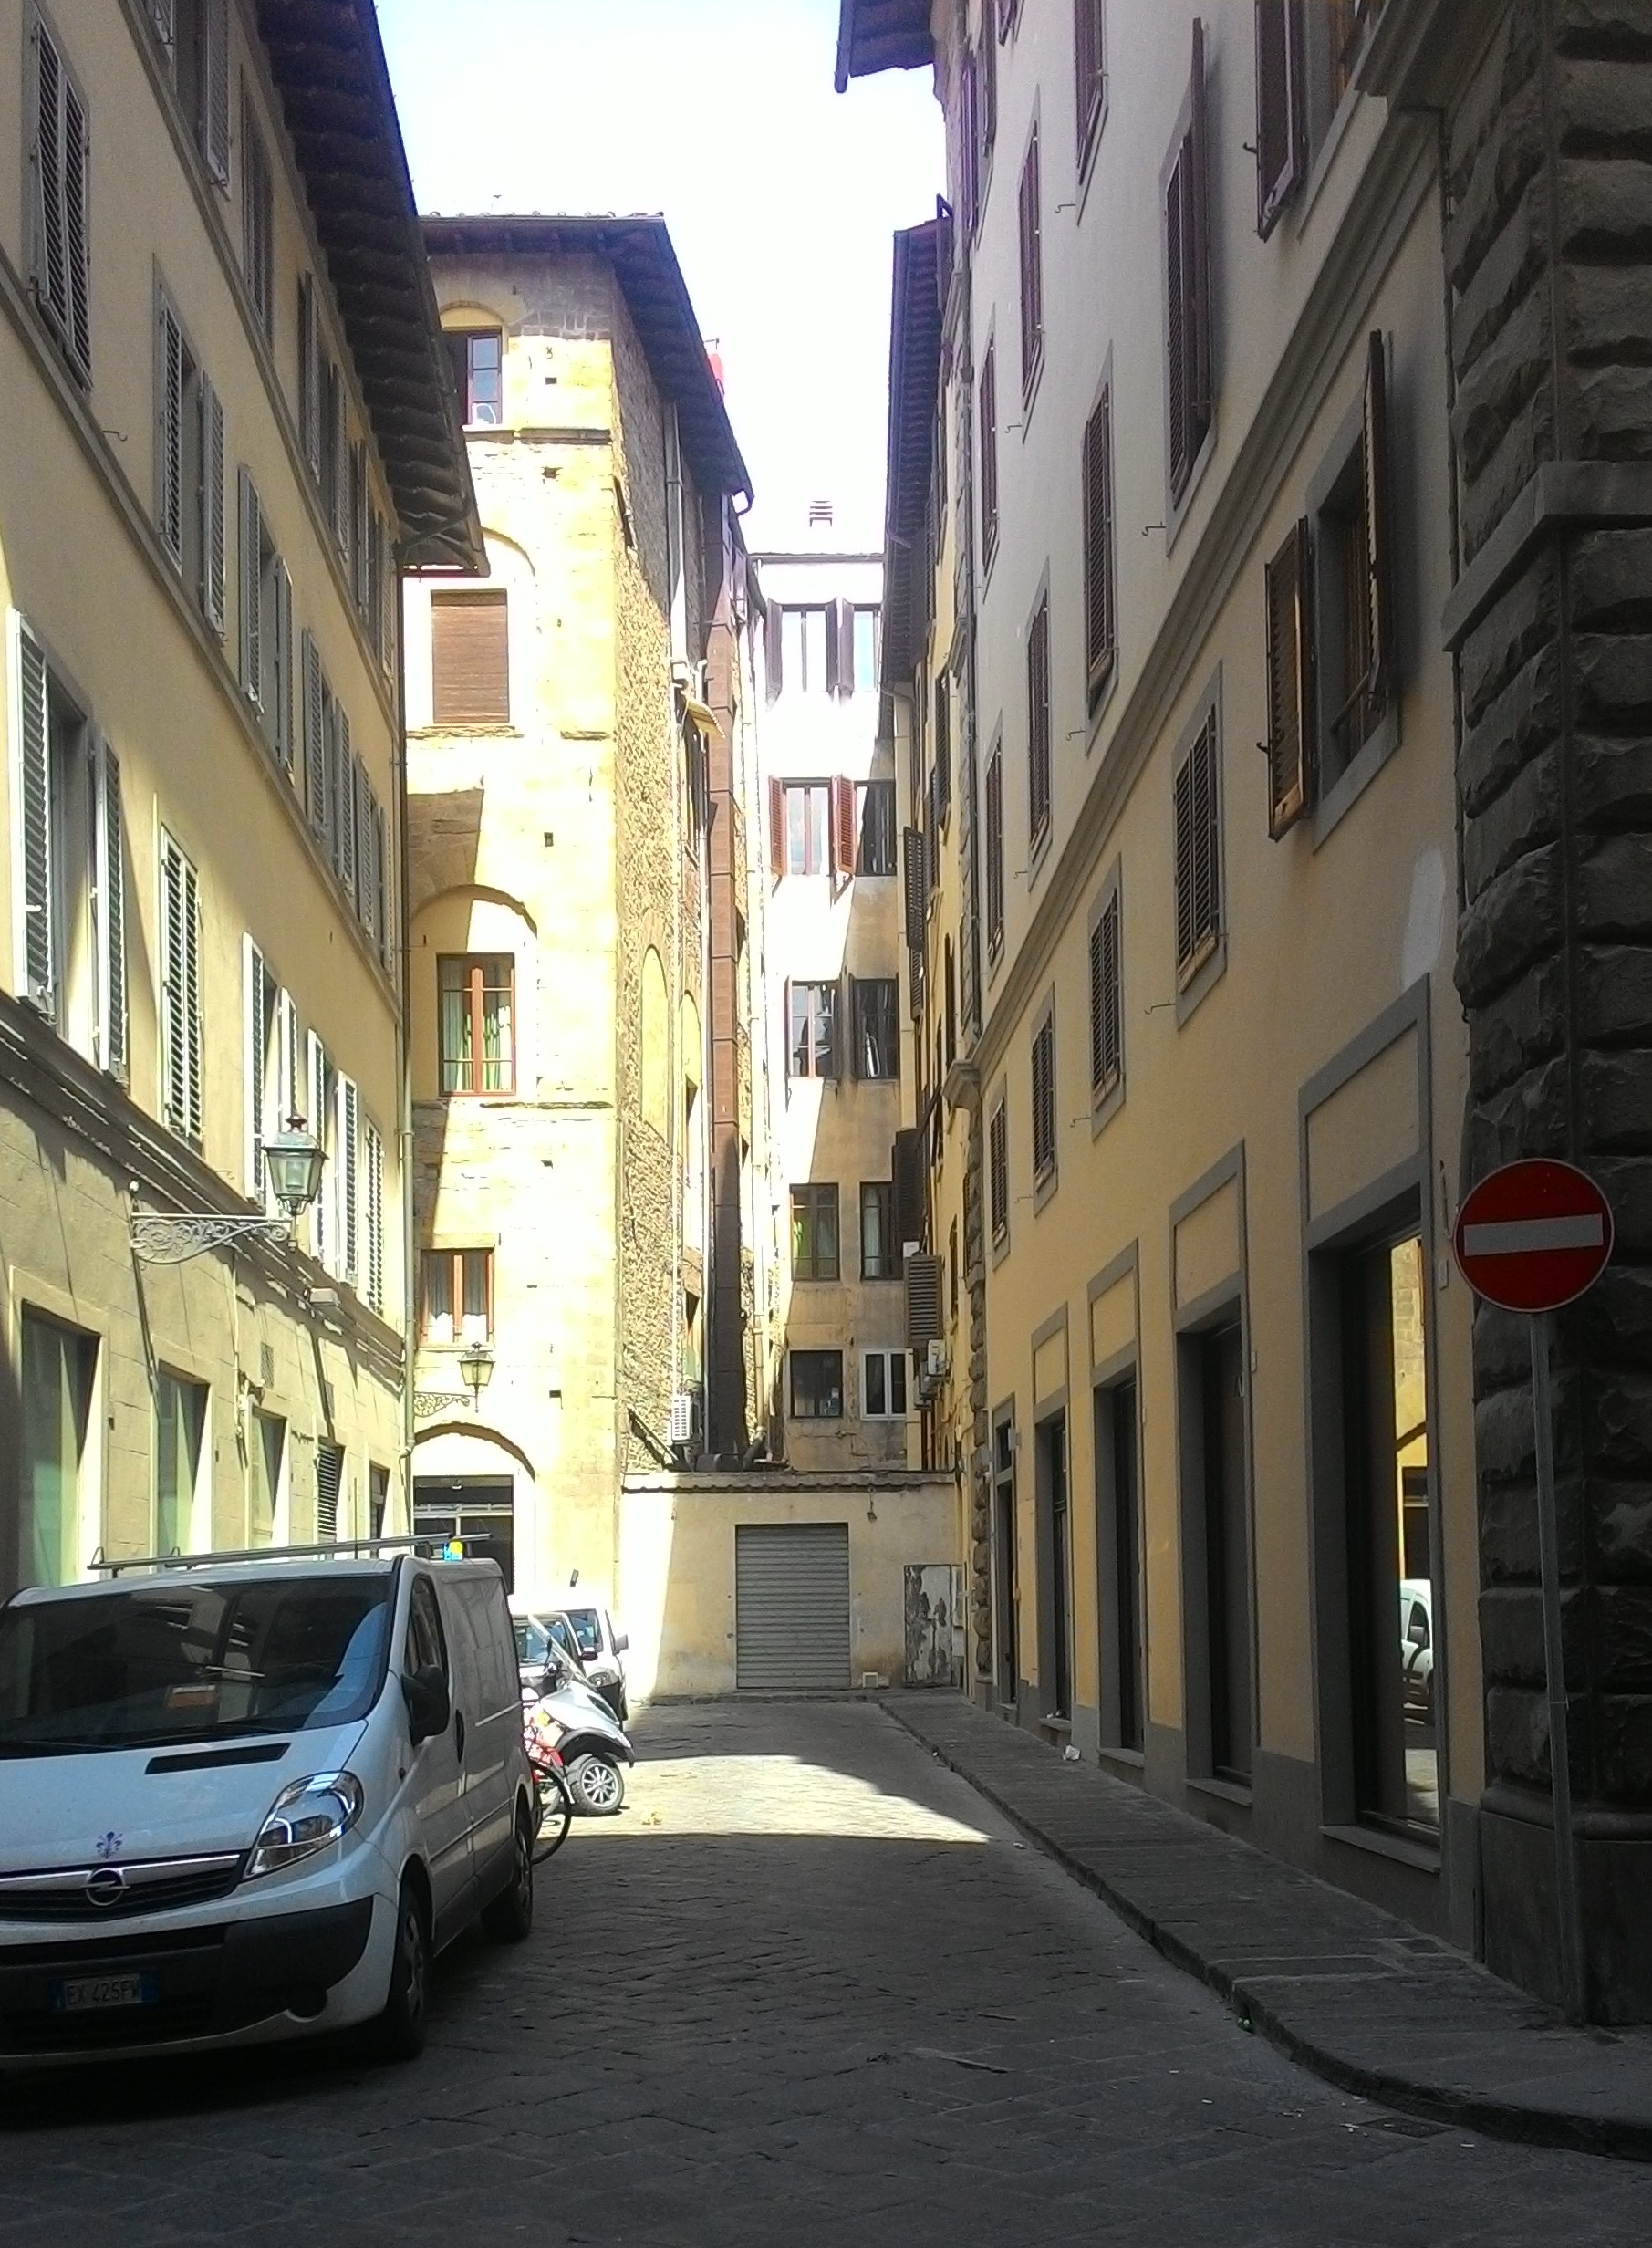 Hotel Dei Cavalieri Firenze